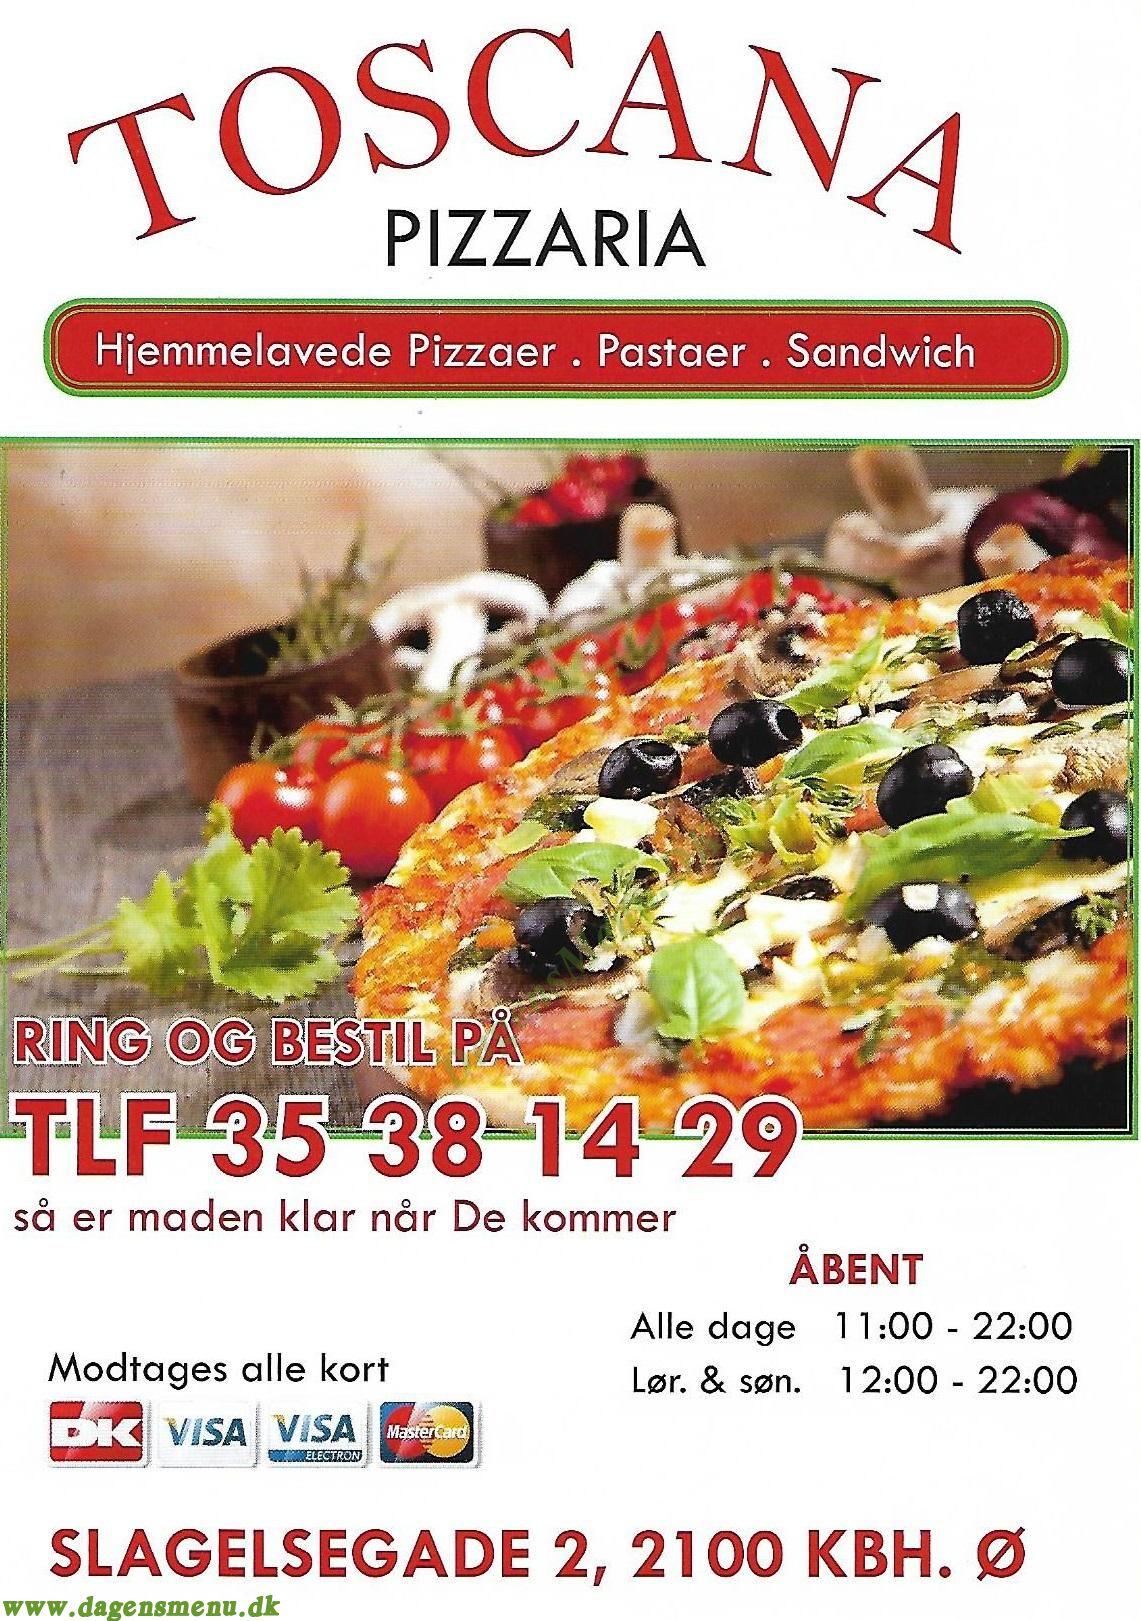 Toscana Pizzeria - Menukort